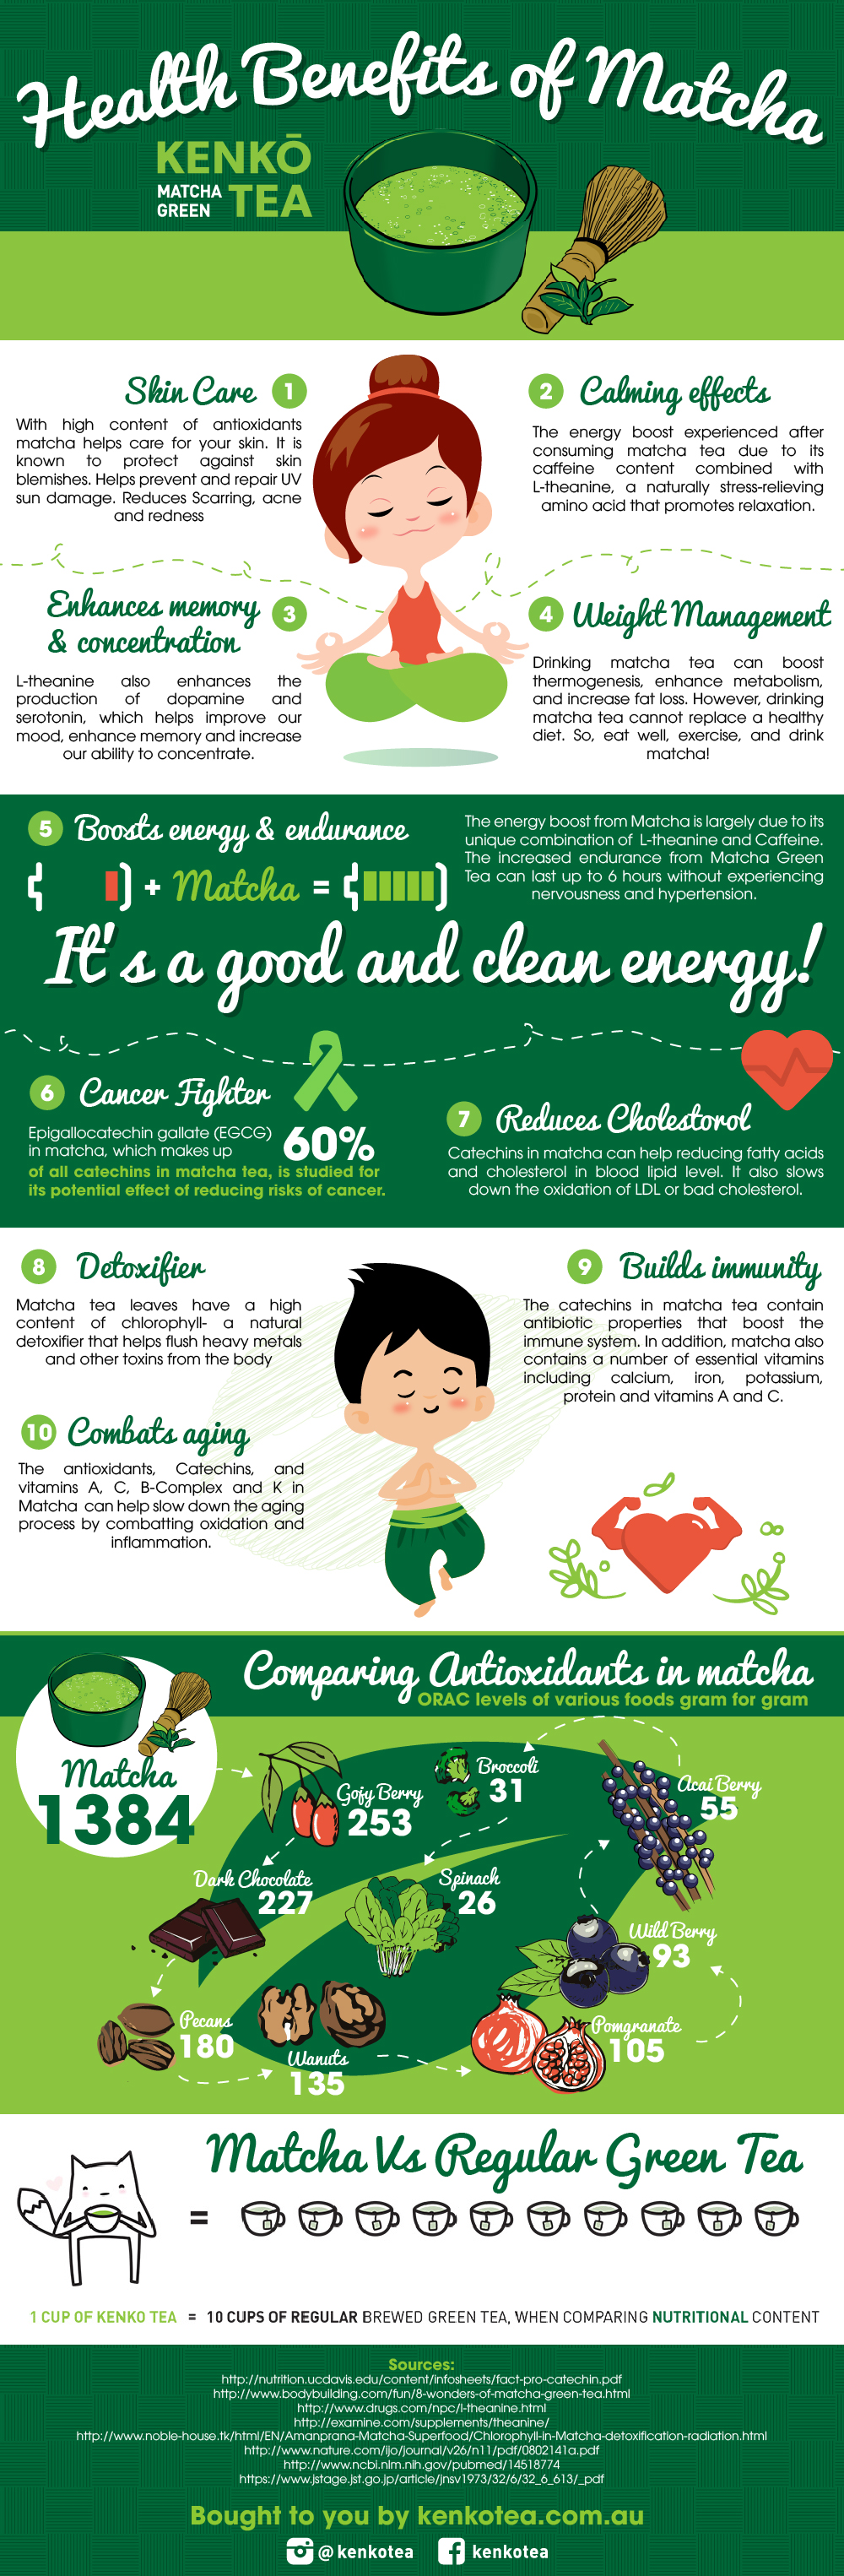 Astounding Health Benefits Of Matcha Green Tea Infographic